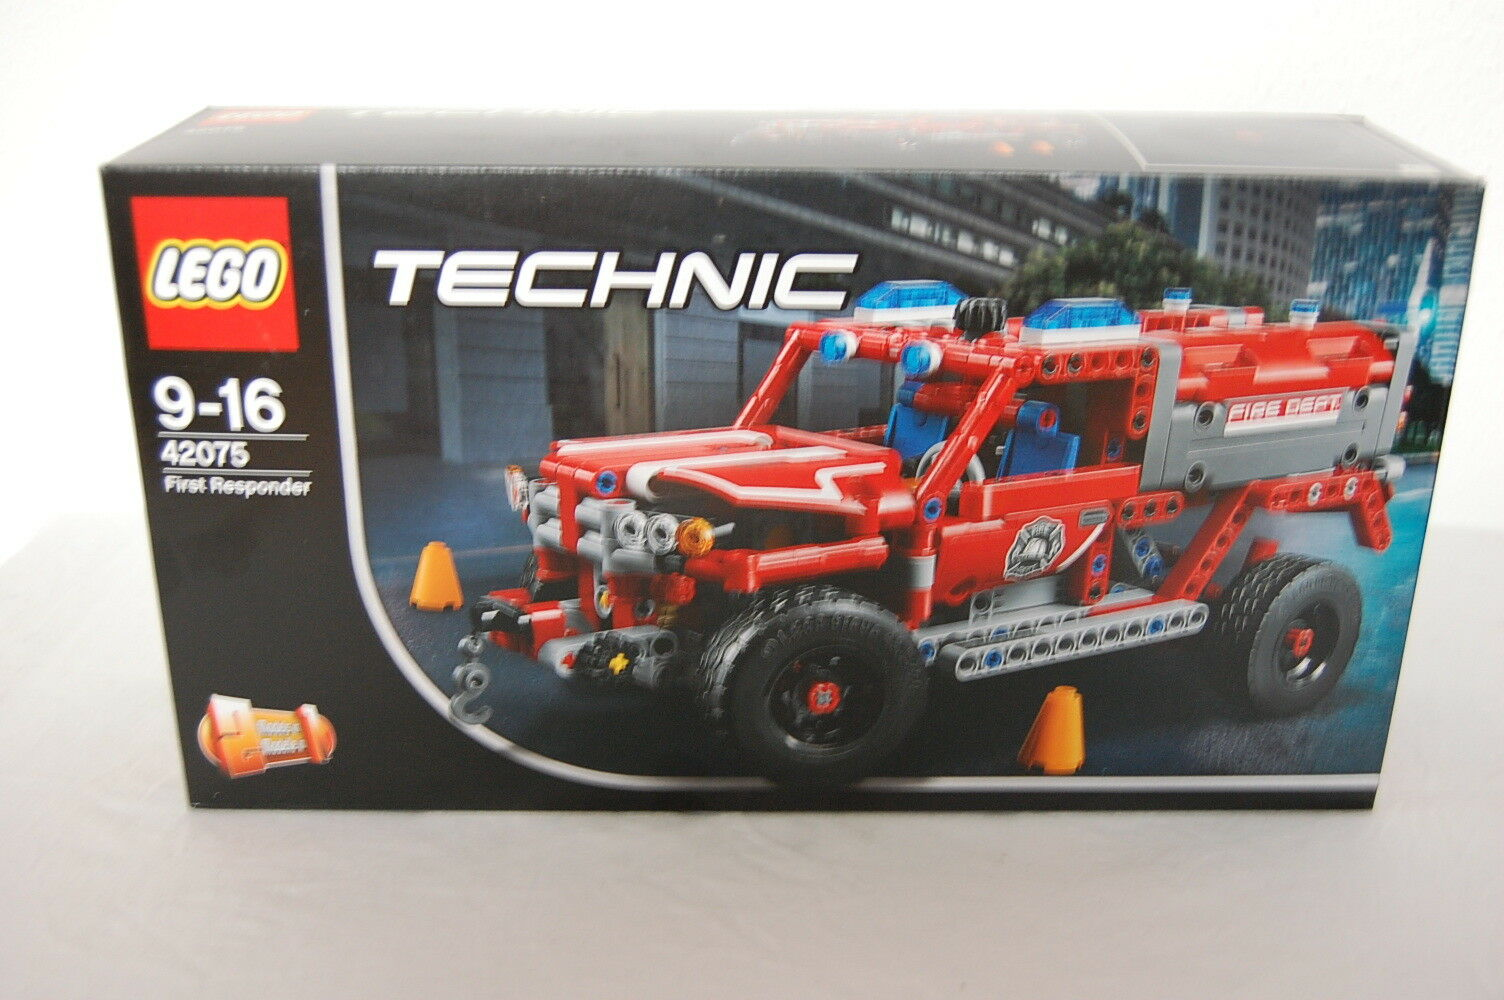 LEGO Technic 42075 First ResponderNeu OVP